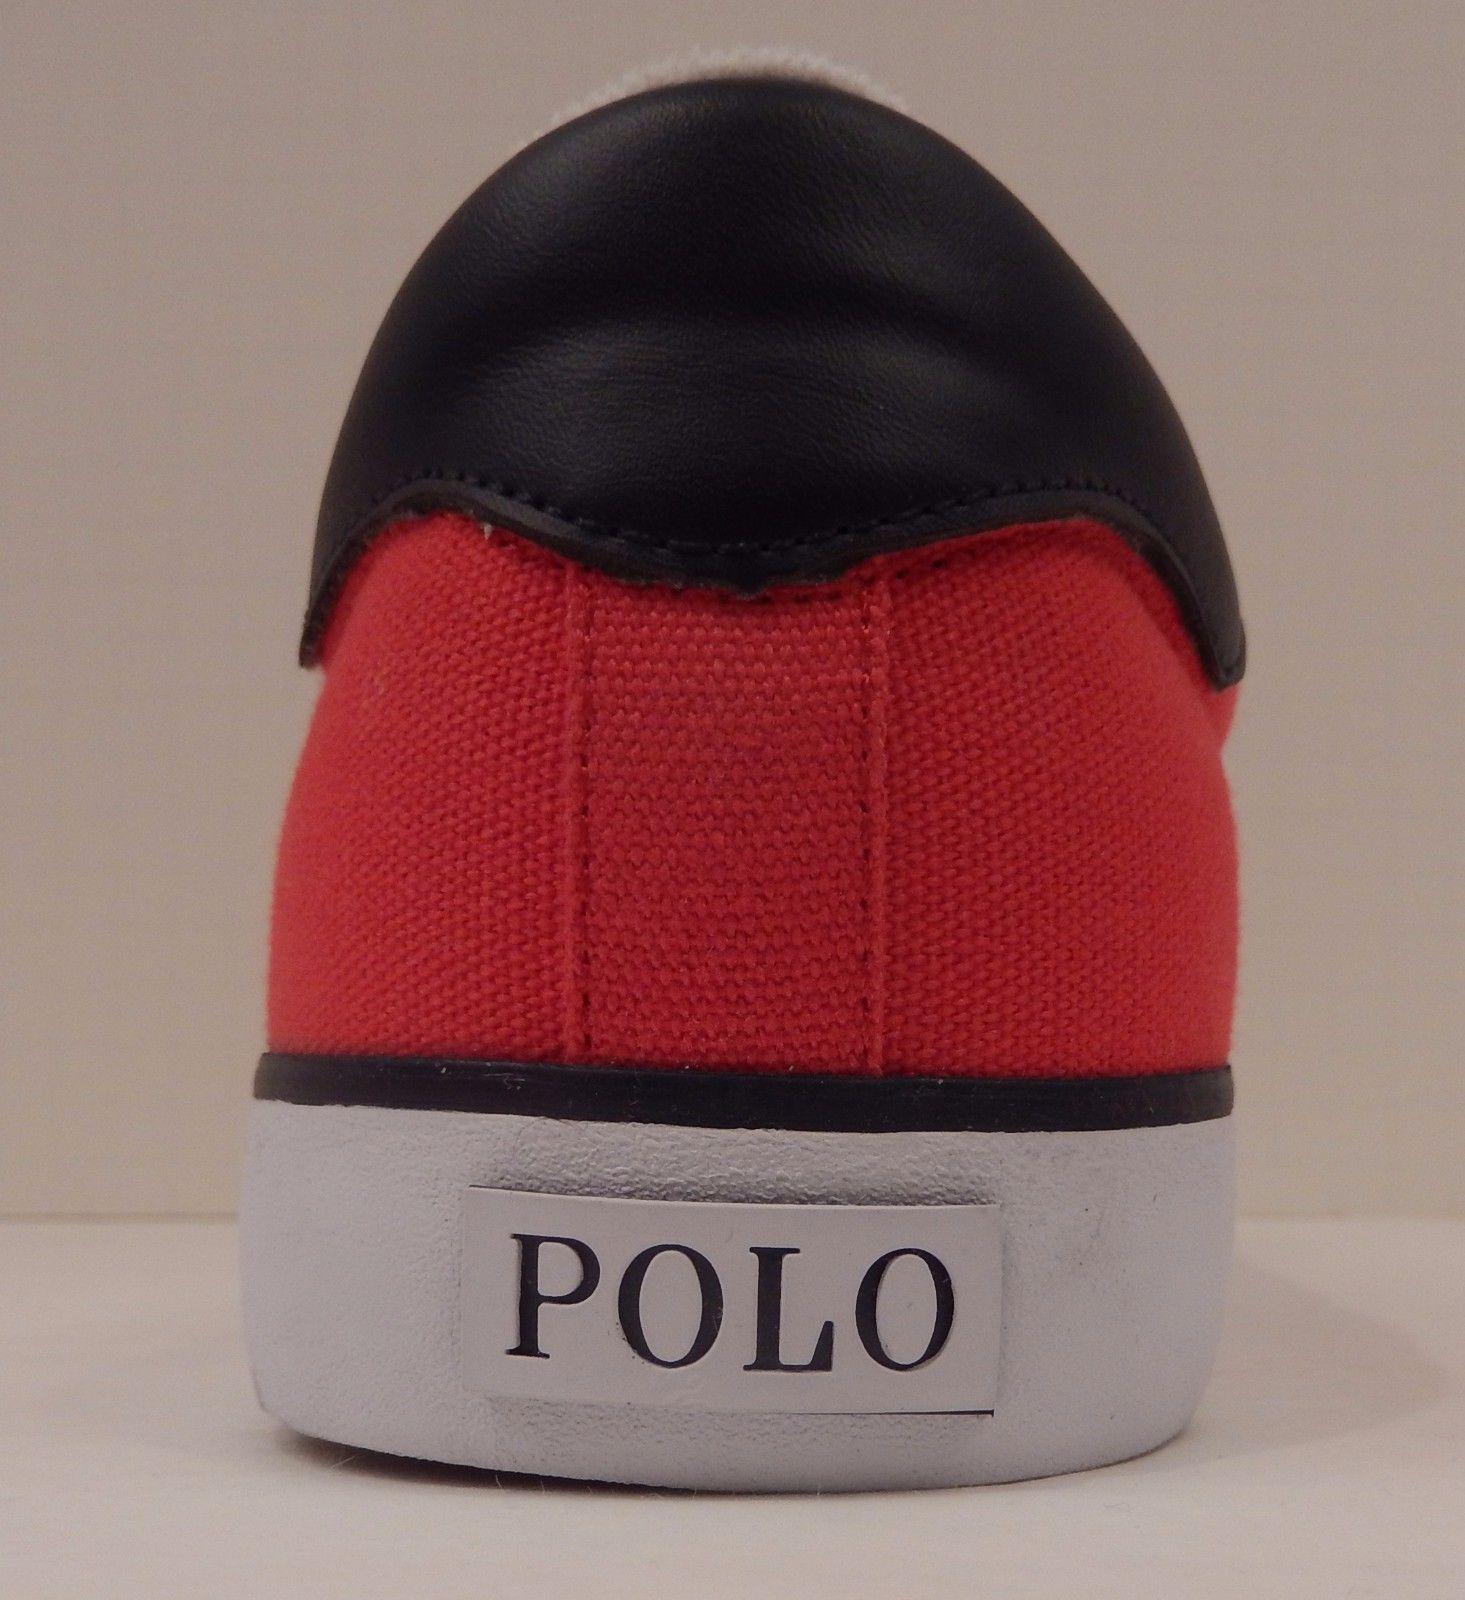 GENUINE POLO RALPH LAUREN MENS SIZE 12 D RED  BLACK FASHION SNEAKER SHOE BURWOOD